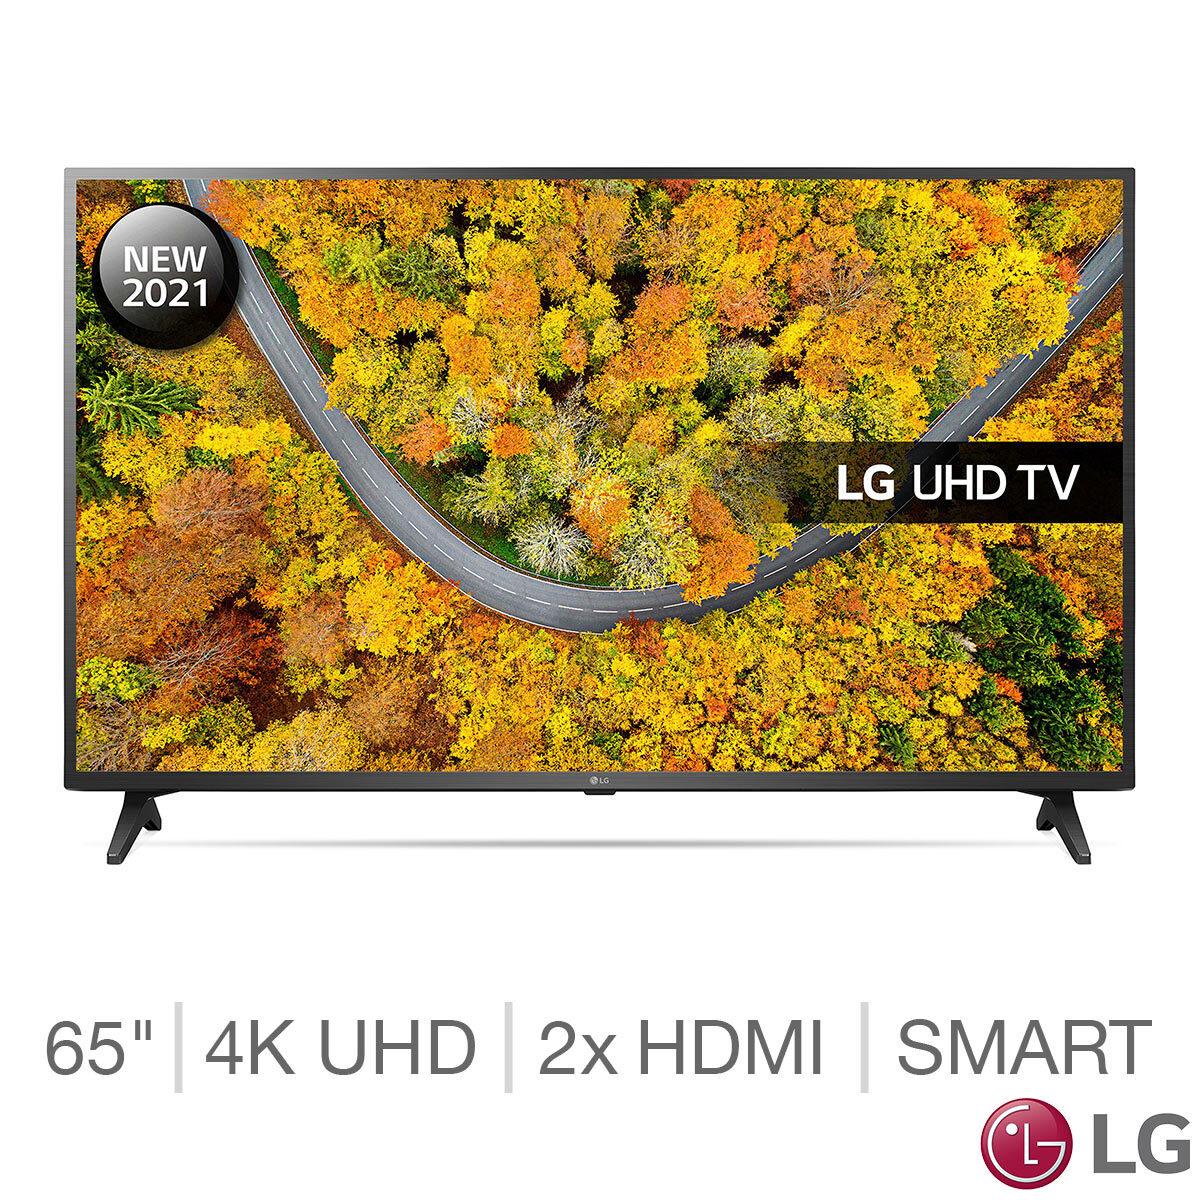 "LG 65UP75006LF 65"" £599.89 or LG 55UP75006LF 55"" £469.99 (2021) - 4K Ultra HD Smart TV + 5 year warranty (Membership Required) @ Costco"